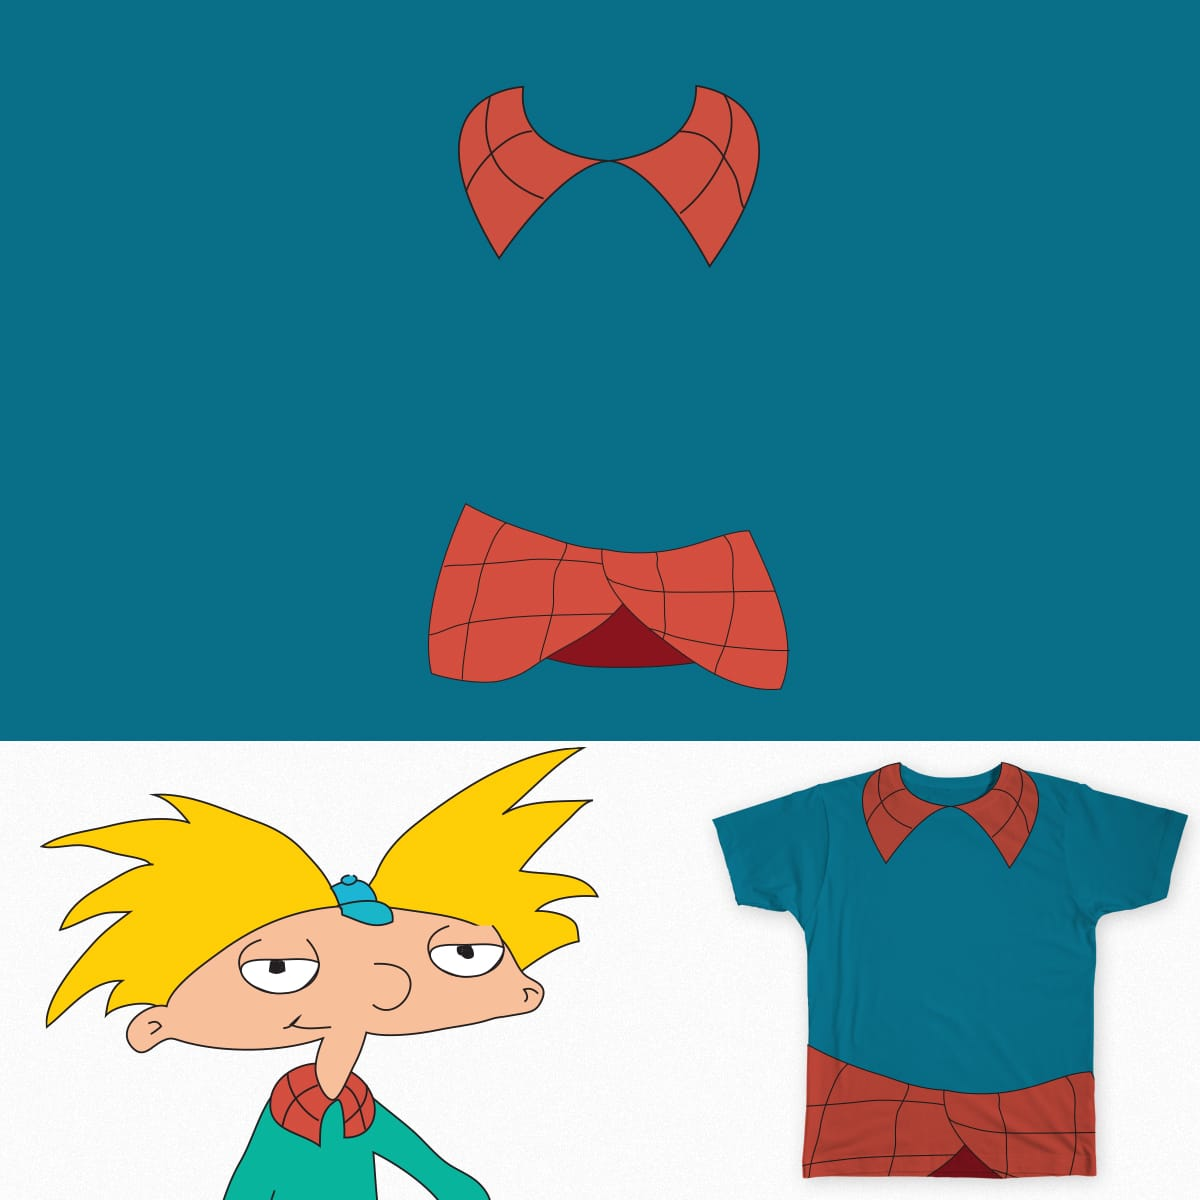 Arnold's shirt by emilyjbro on Threadless